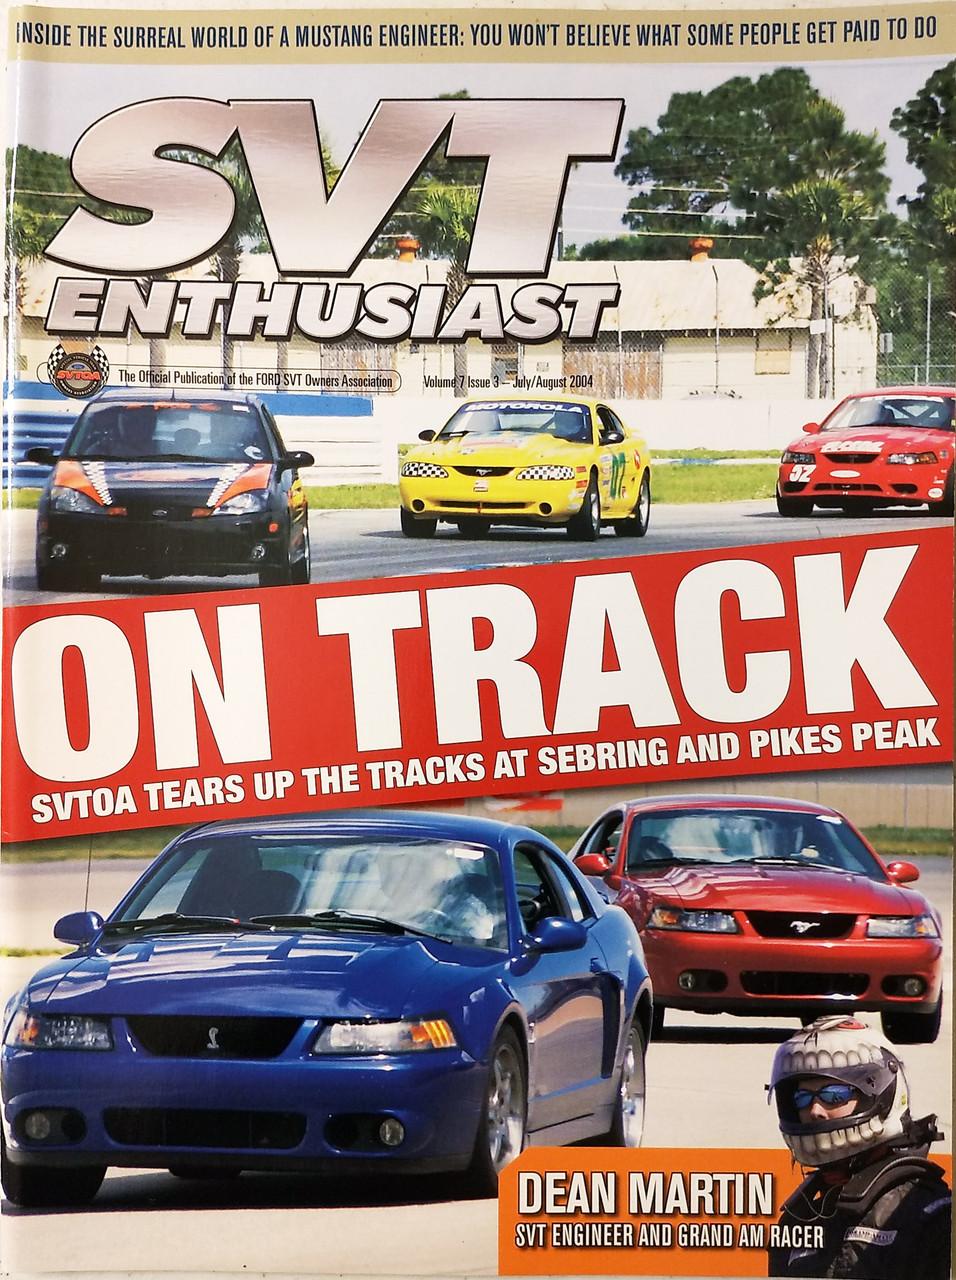 SVT Enthusiast Magazine - Vol7 Iss3 Jul/Aug 2004